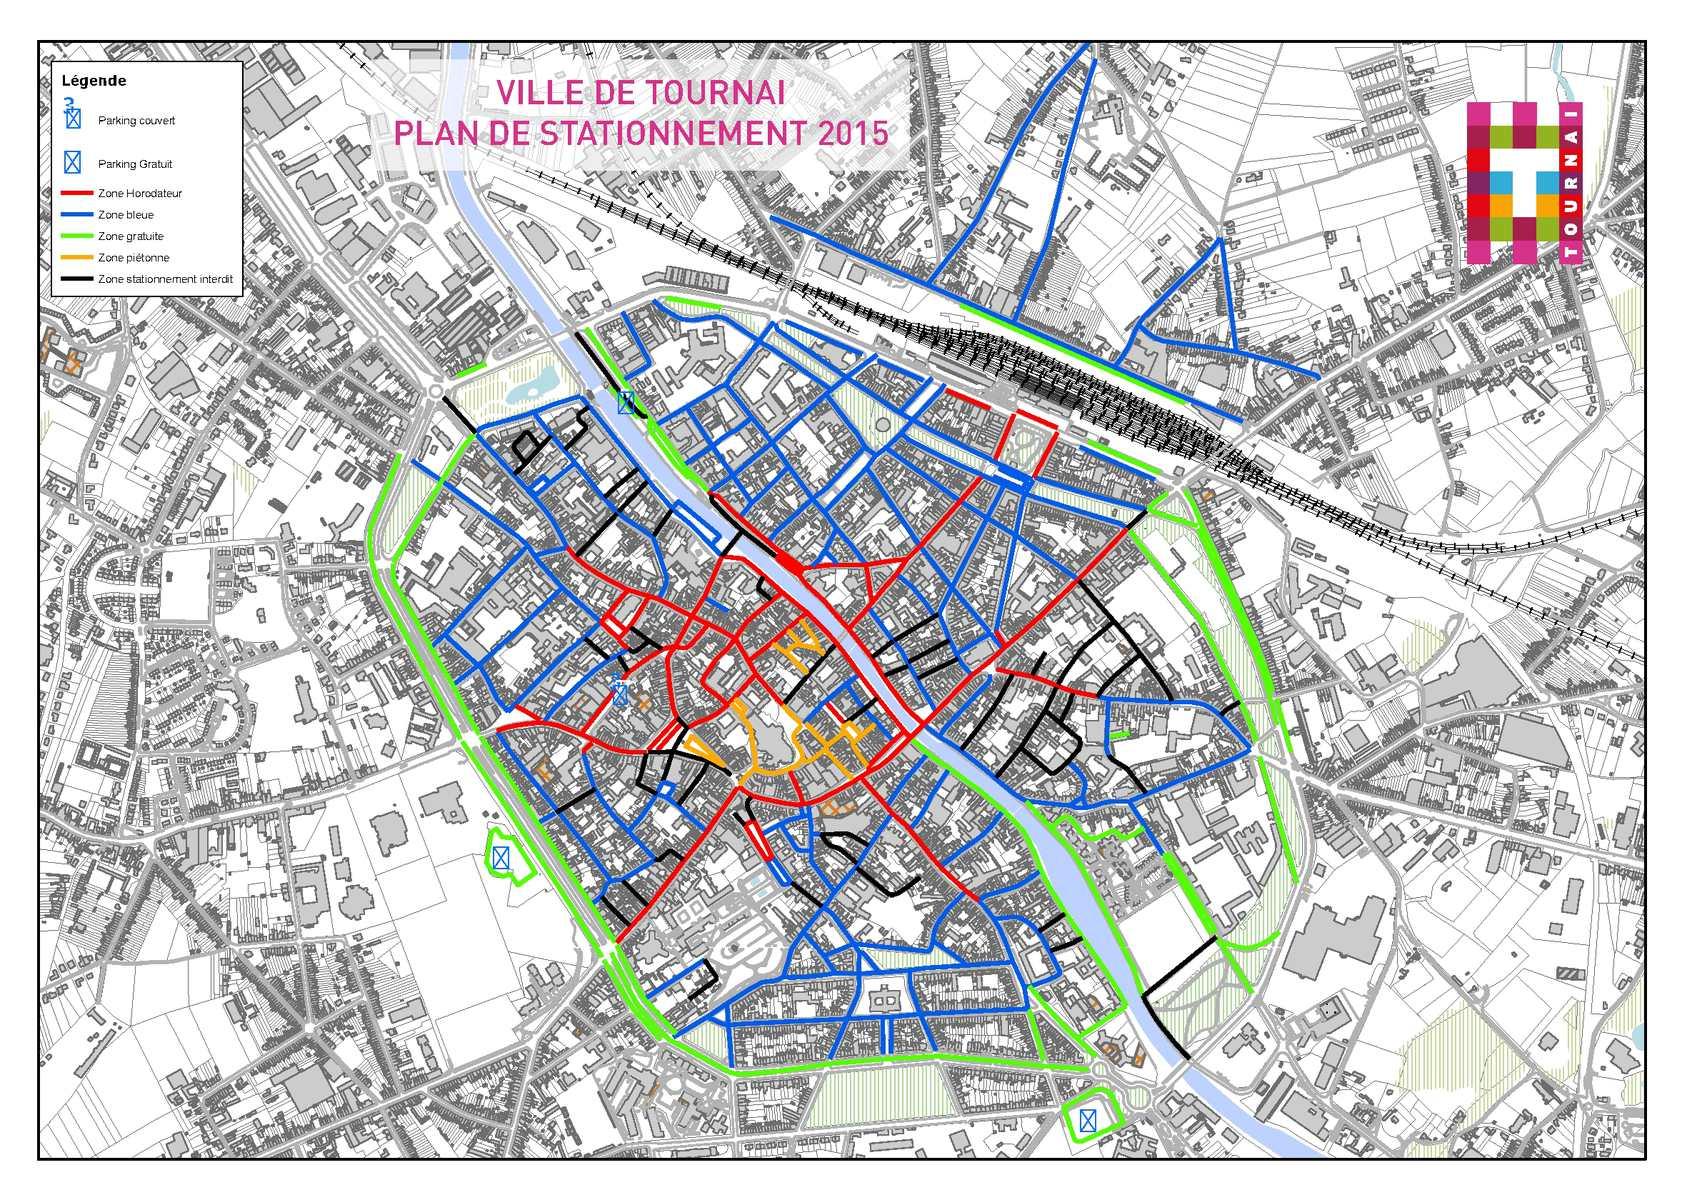 Carte Zone Bleue Tournai.Calameo Ville De Tournai Plan De Stationnement 2015